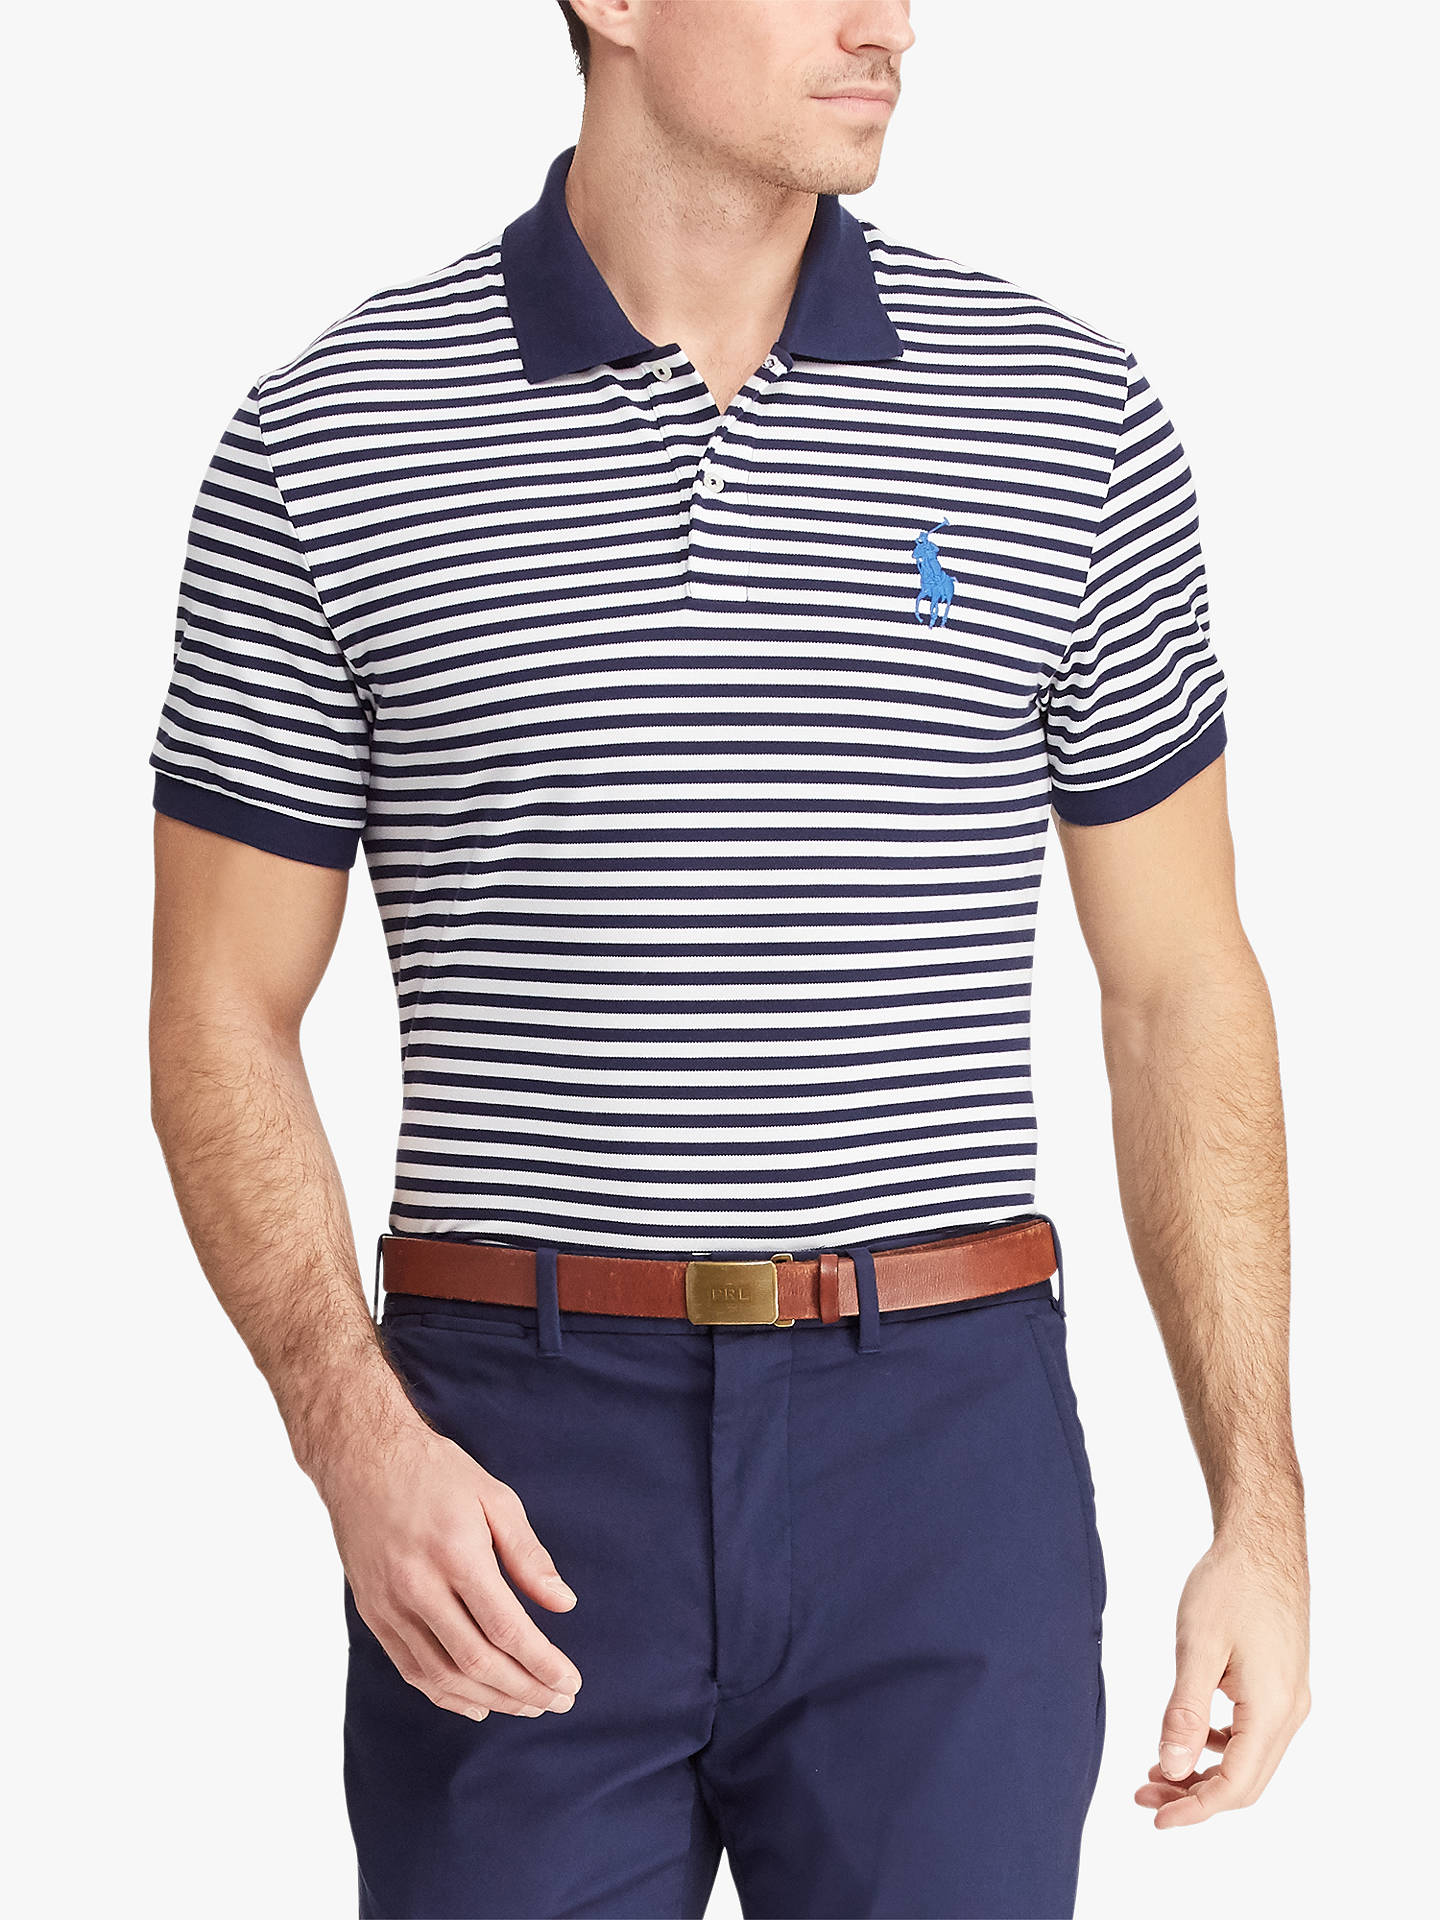 8820b7c31 Polo Golf by Ralph Lauren Custom Slim Fit Performance Polo Shirt ...